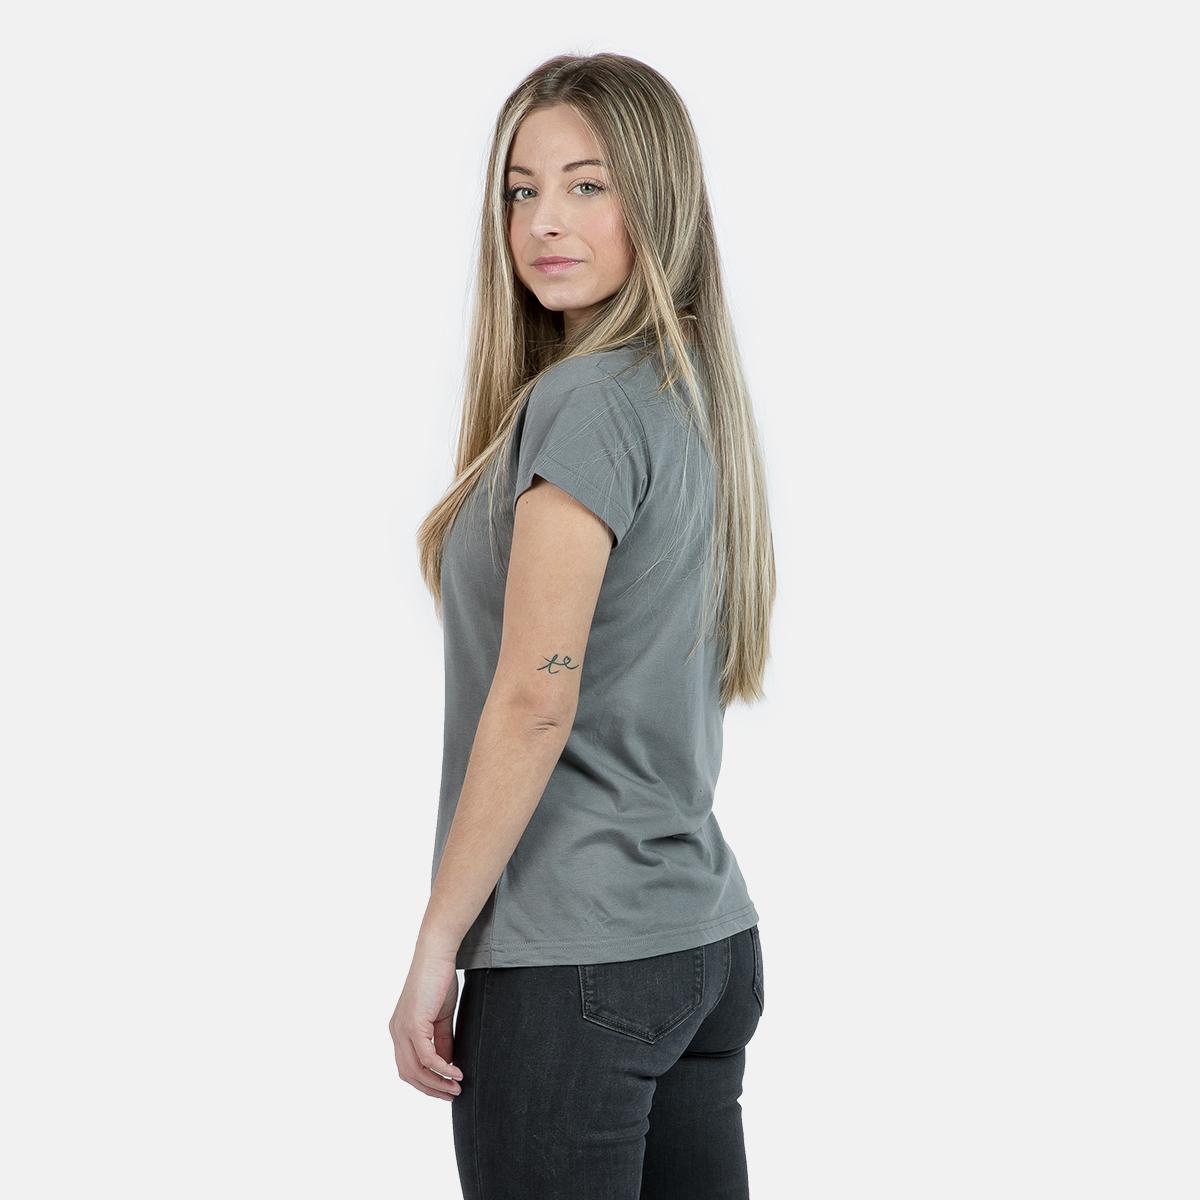 WOMAN'S SAS T-SHIRT BLUE